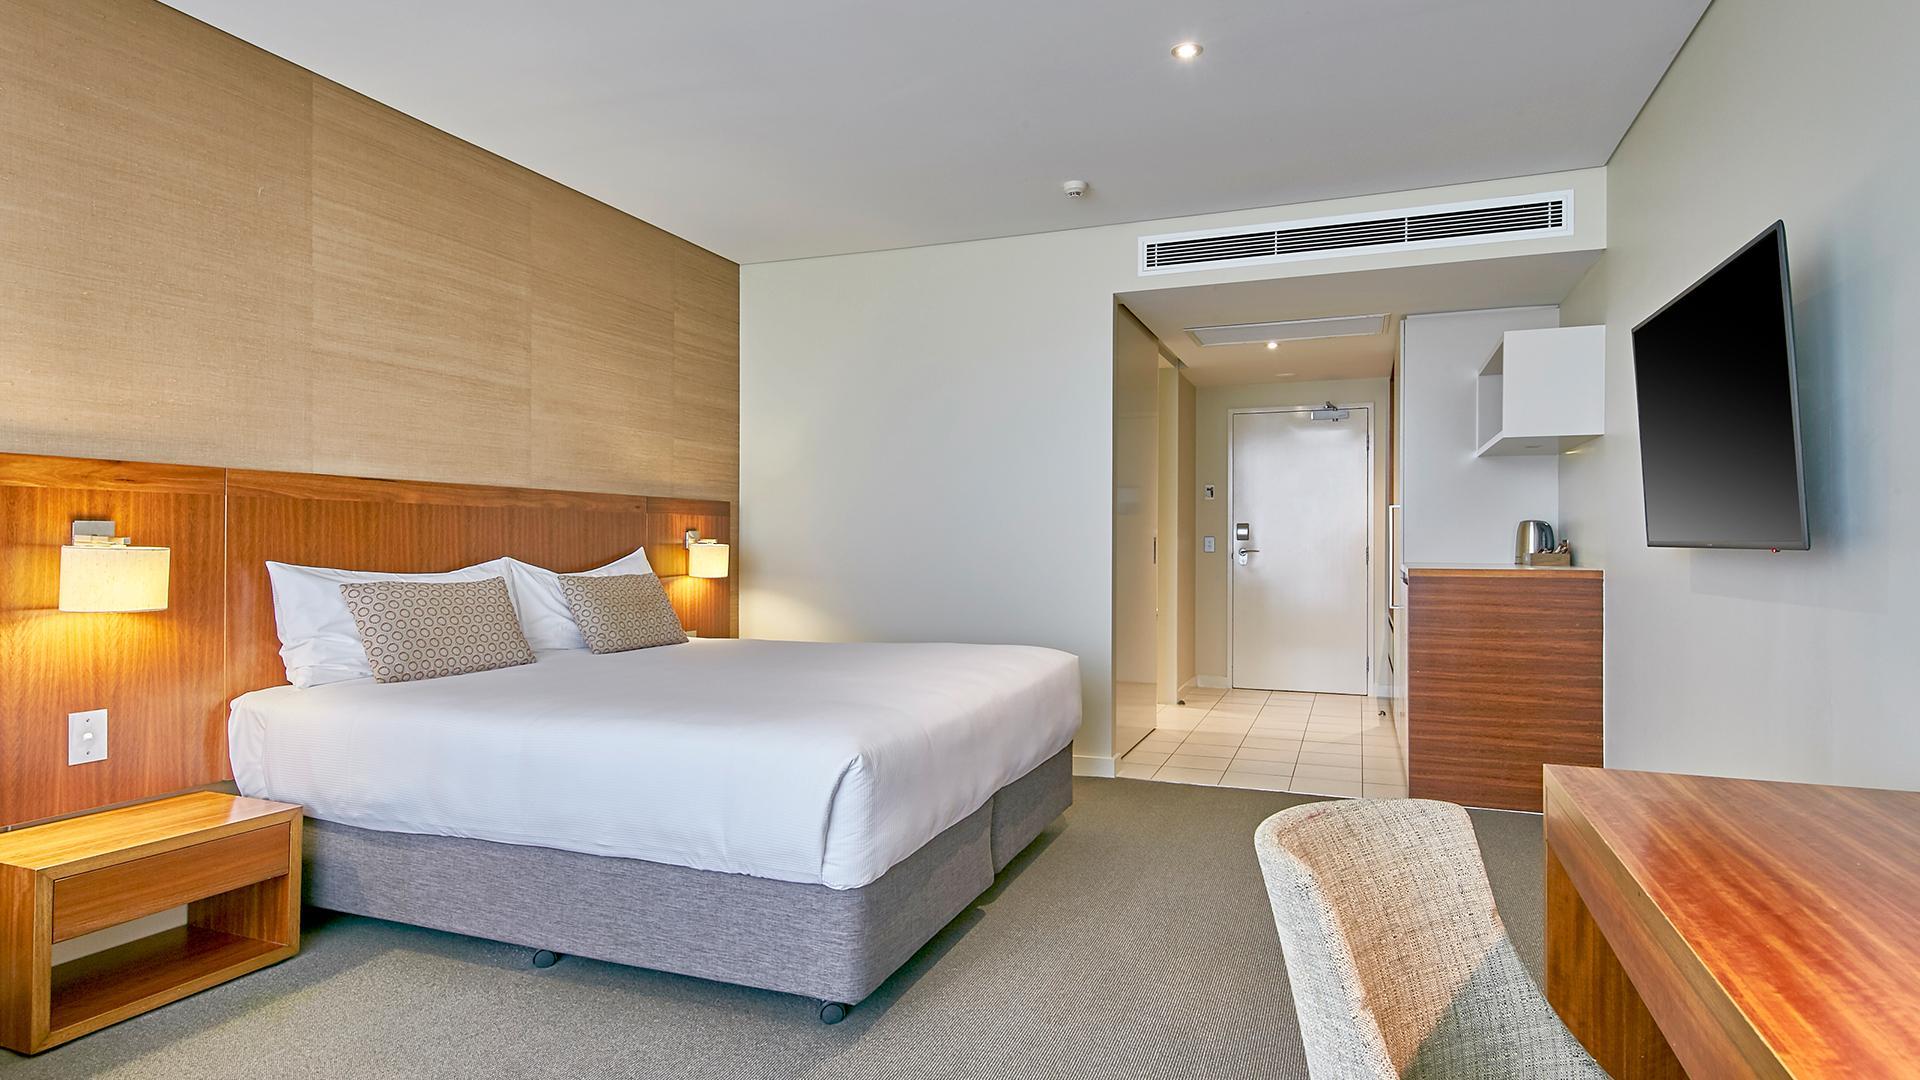 Superior King Room image 1 at The Sebel Mandurah by City of Mandurah, Western Australia, Australia